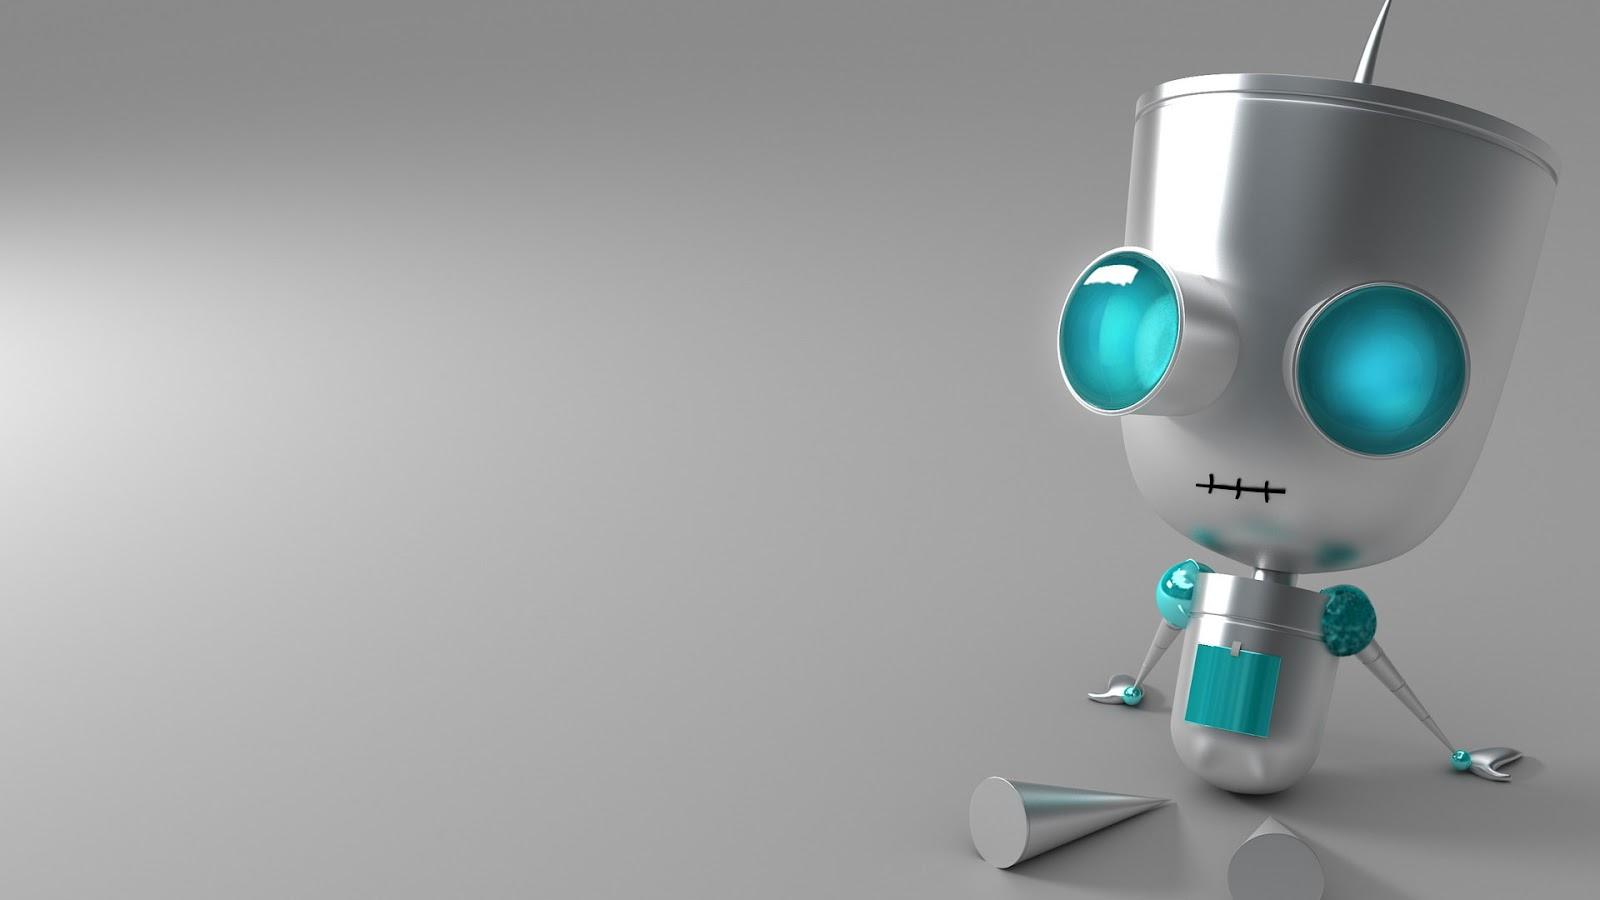 Cute Robot Wallpaper Top HD Wallpapers 1600x900